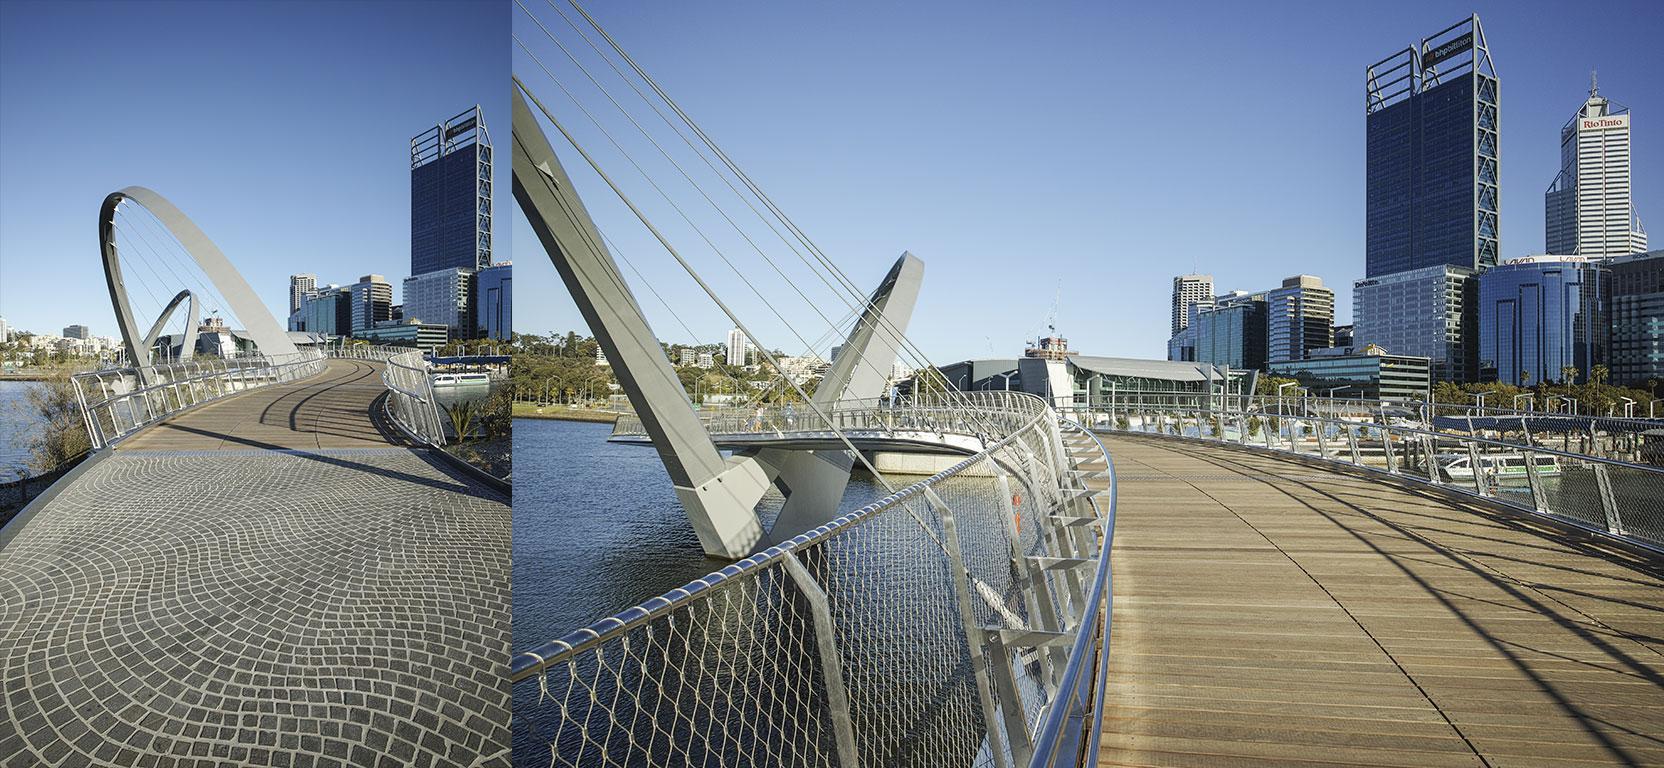 drupal-figure-3-elizabeth-quay-pedestrian-bridge_c-jacaranda-photography1.jpg